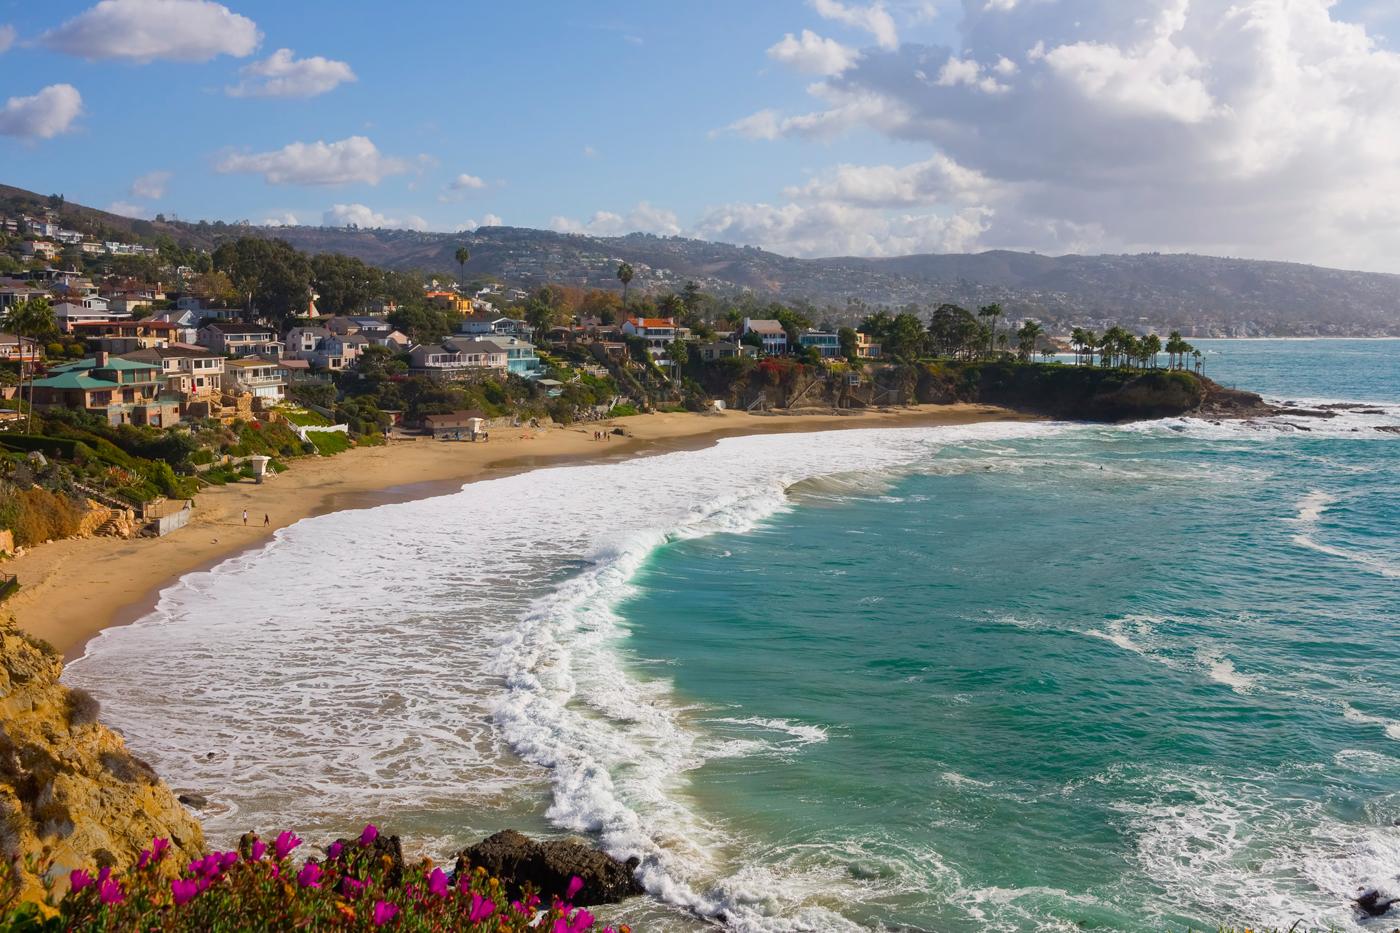 Top HD Laguna Beach Wallpaper Travelling HD 115958 KB 1400x933